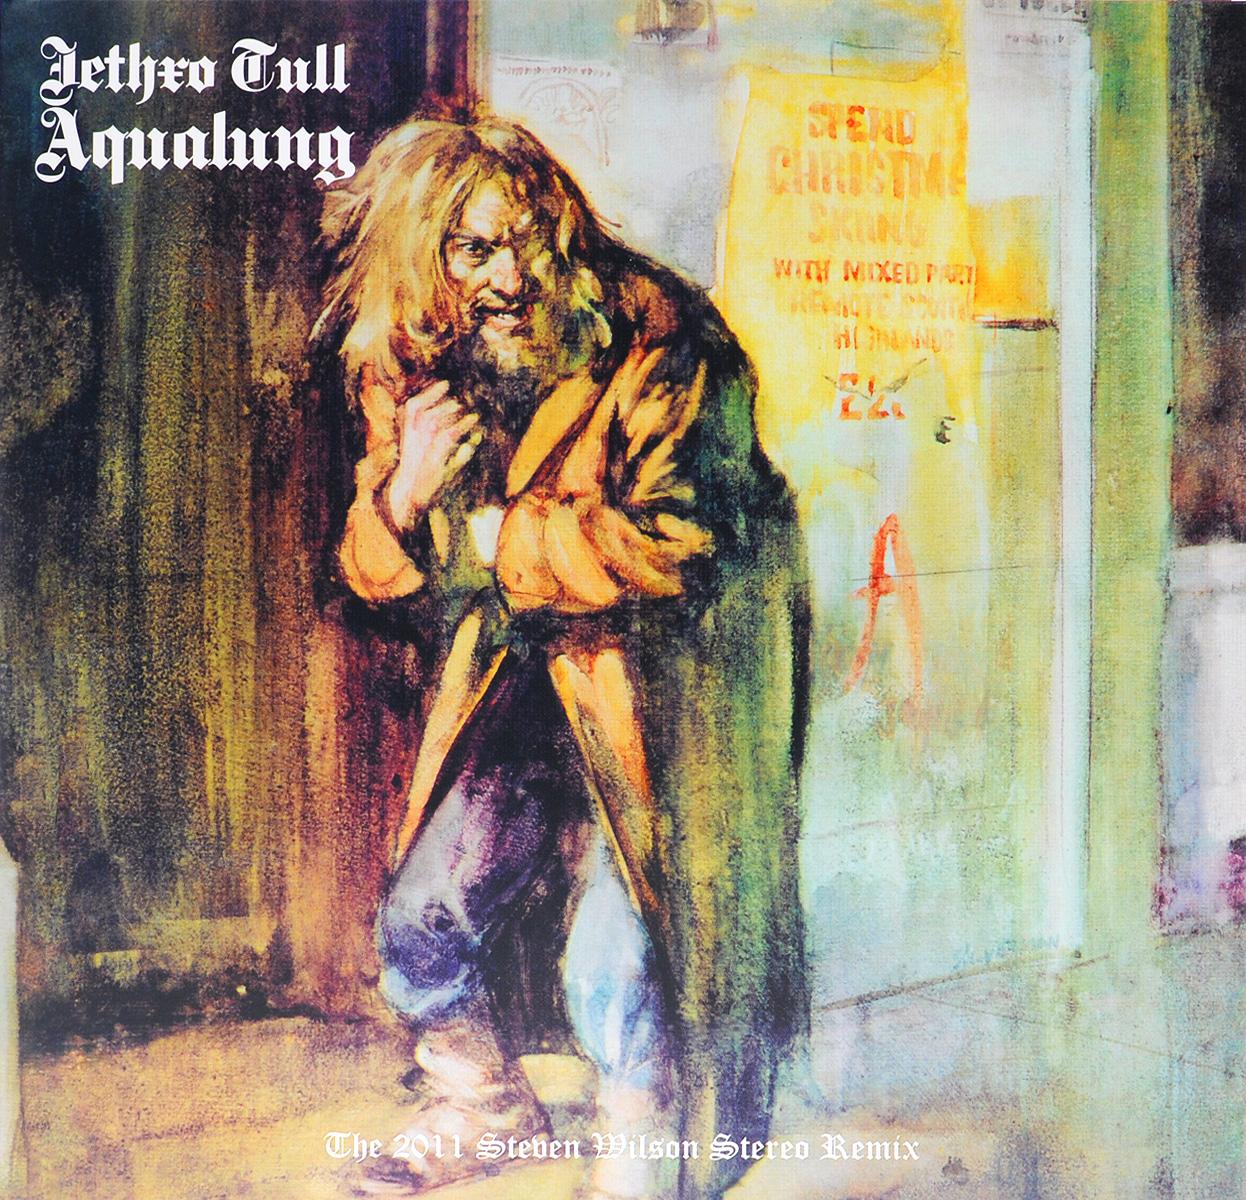 Jethro Tull Jethro Tull. Aqualung (LP) jethro tull jethro tull live at carnegie hall 1970 2 lp